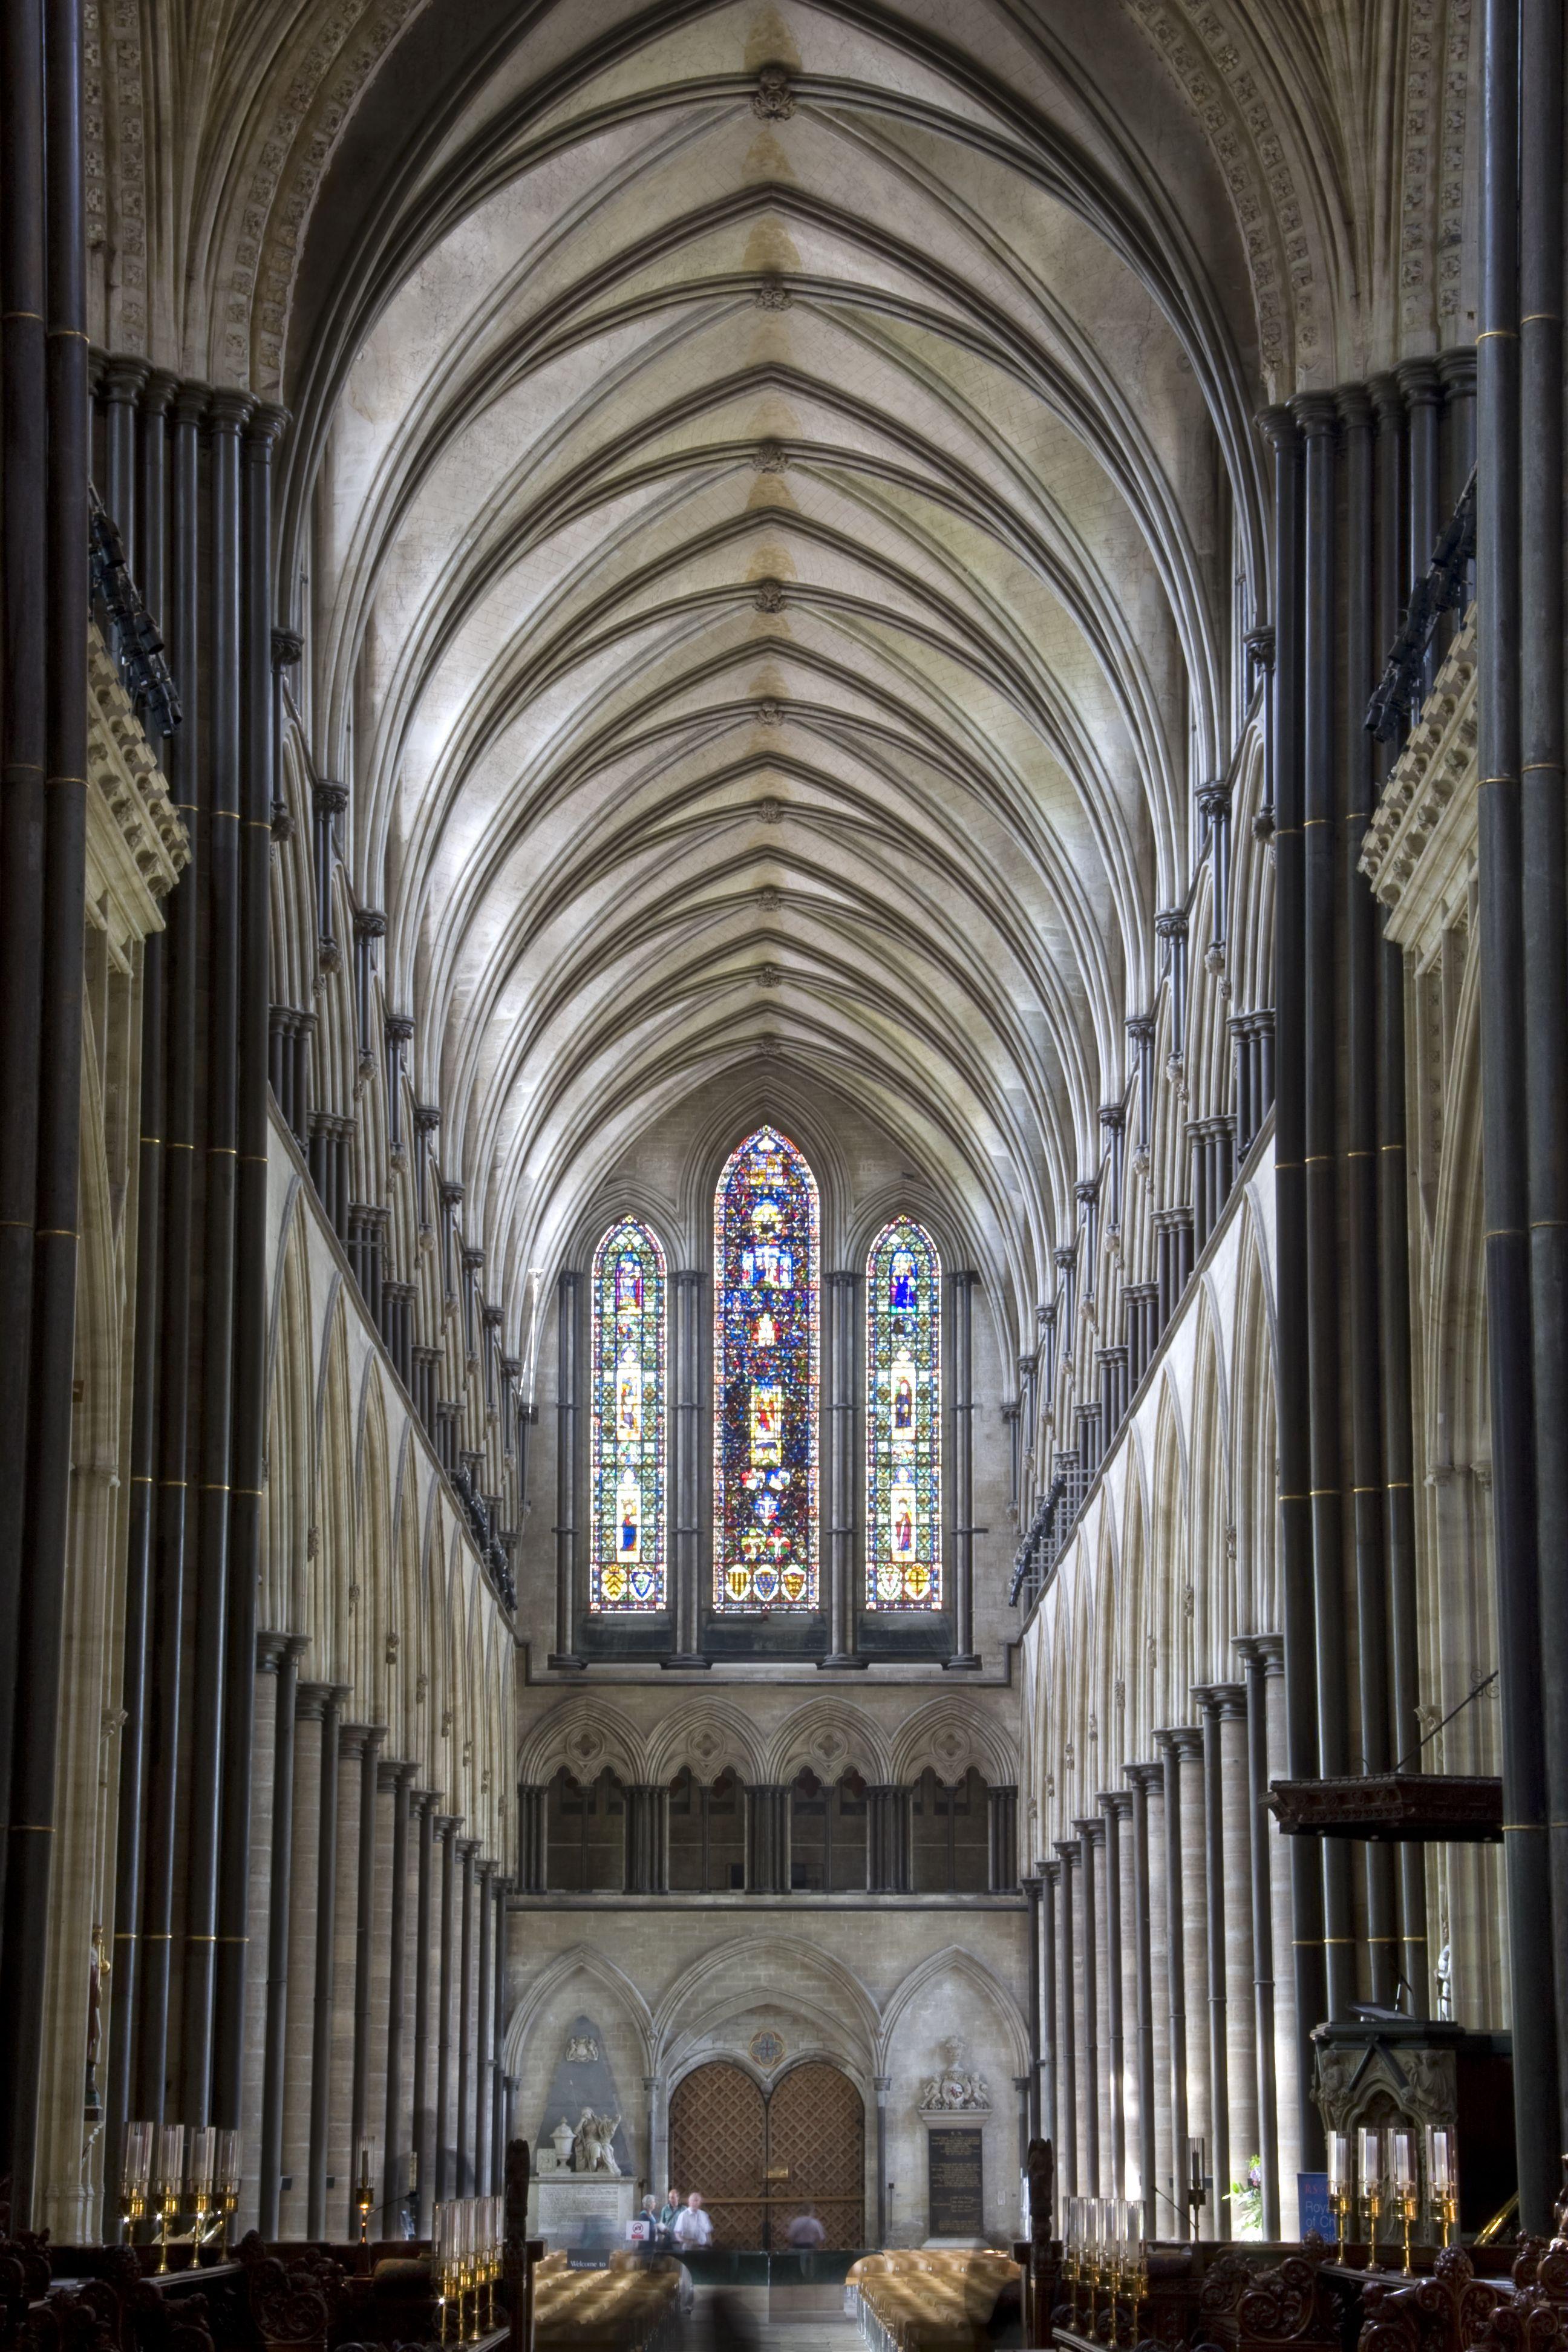 salisbury cathedral - photo #35